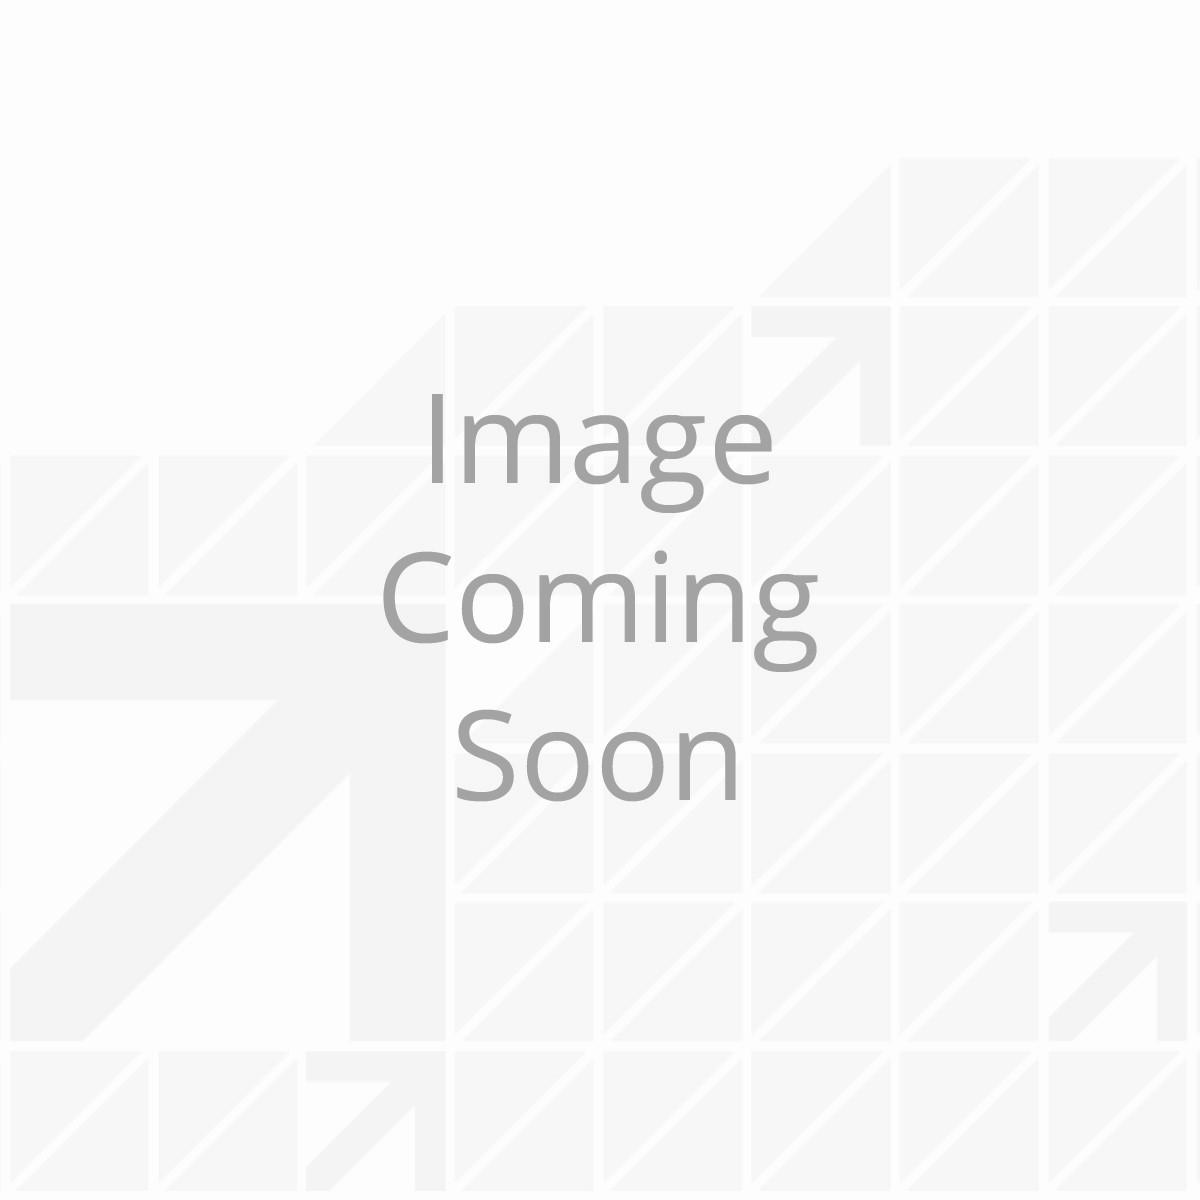 21' Power & Hybrid Awning Roller Assembly - Prepflex Green Fade